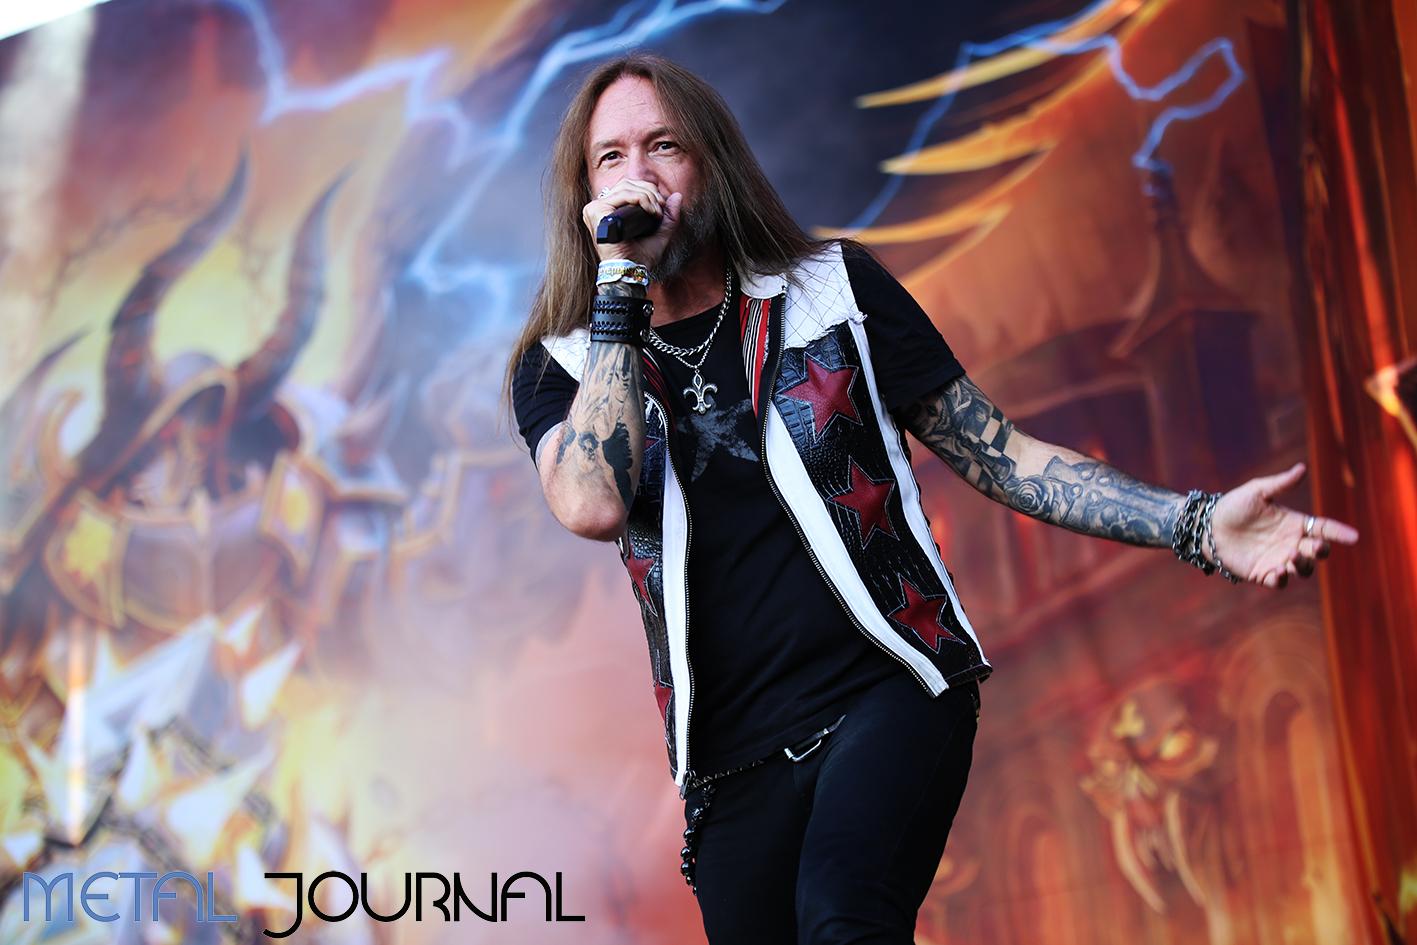 hammerfall - leyendas del rock 2019 metal journal pic 7